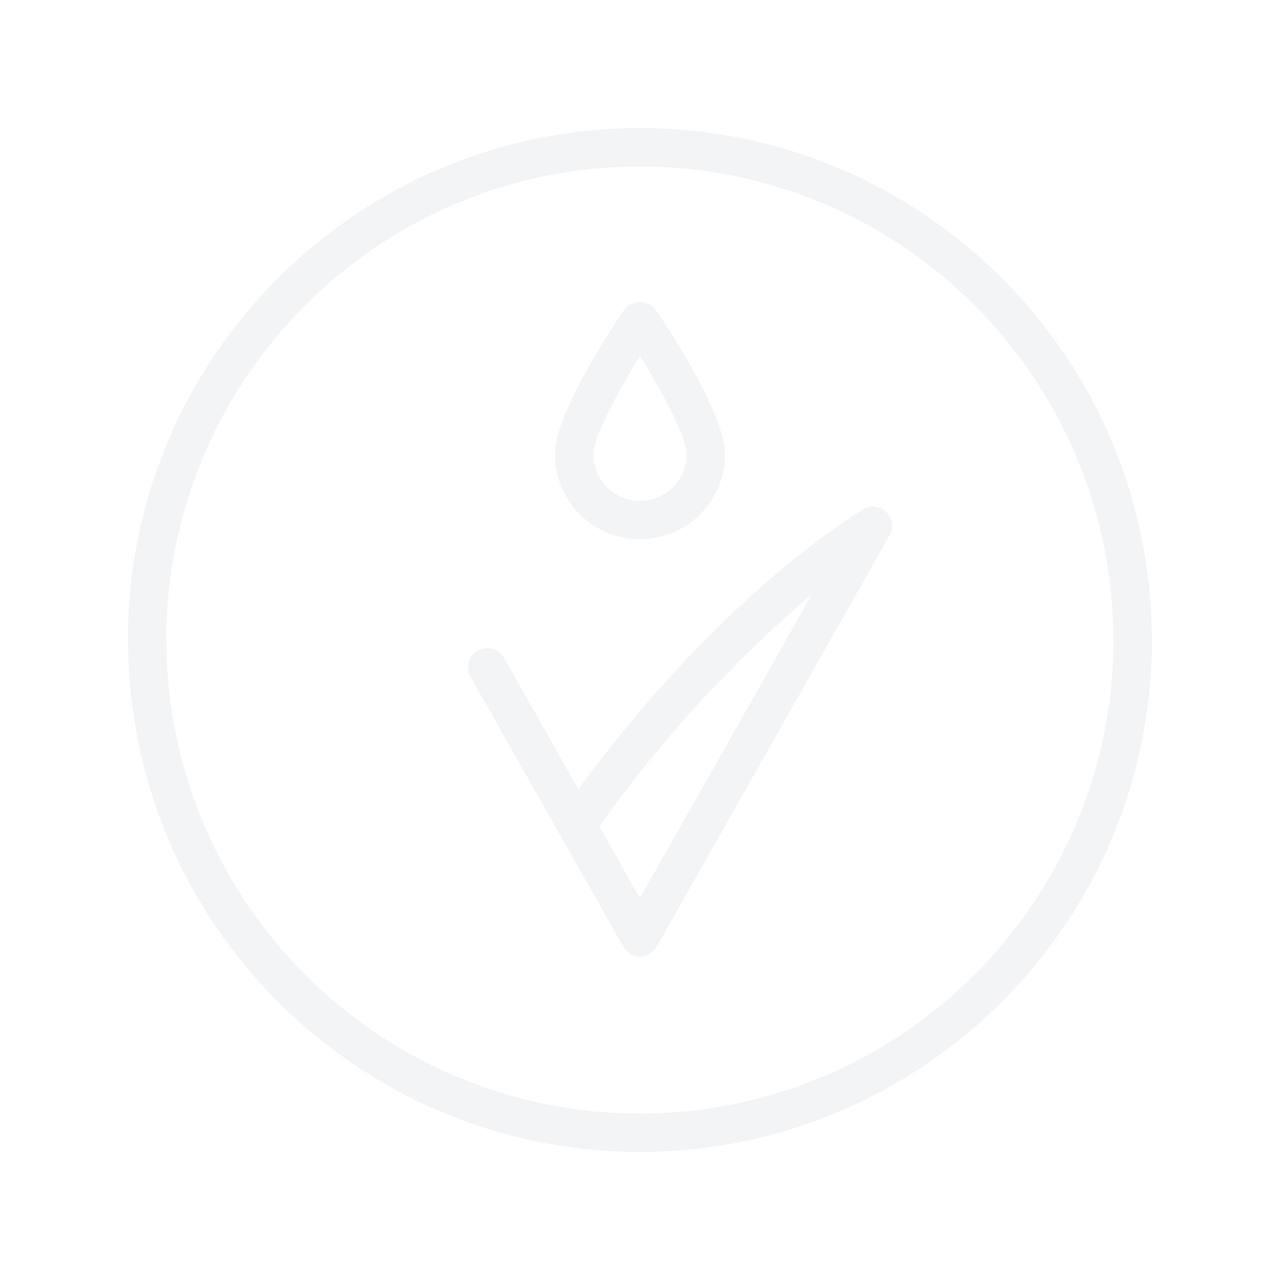 ELIZABETH ARDEN 5th Avenue 30ml Eau De Parfum komplekt